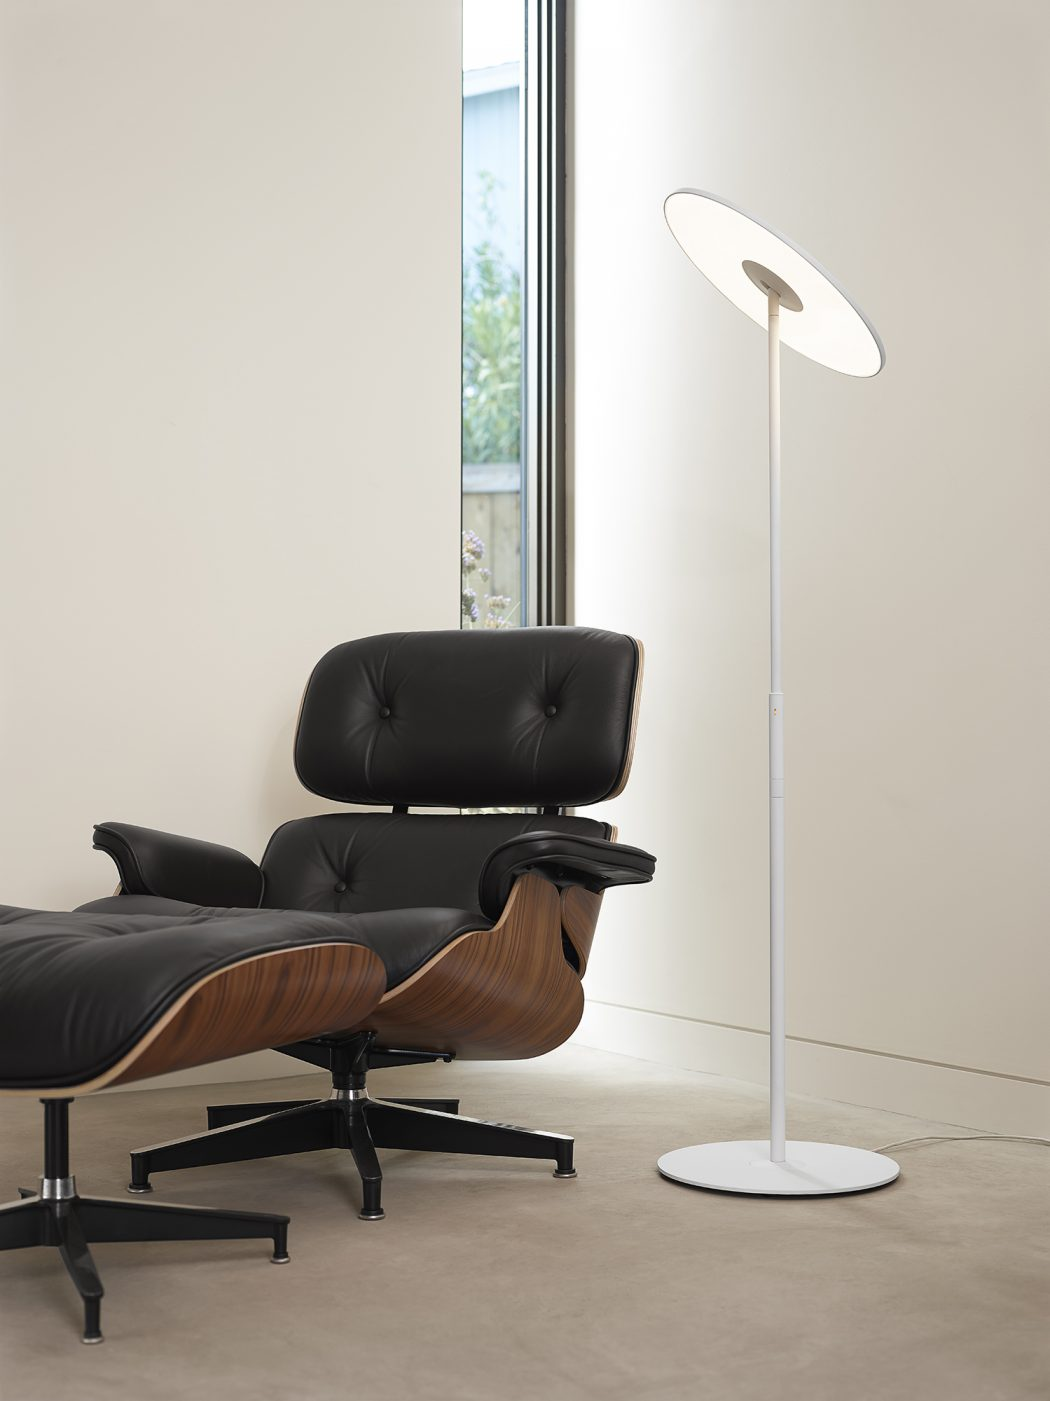 circa-floor-lamp1